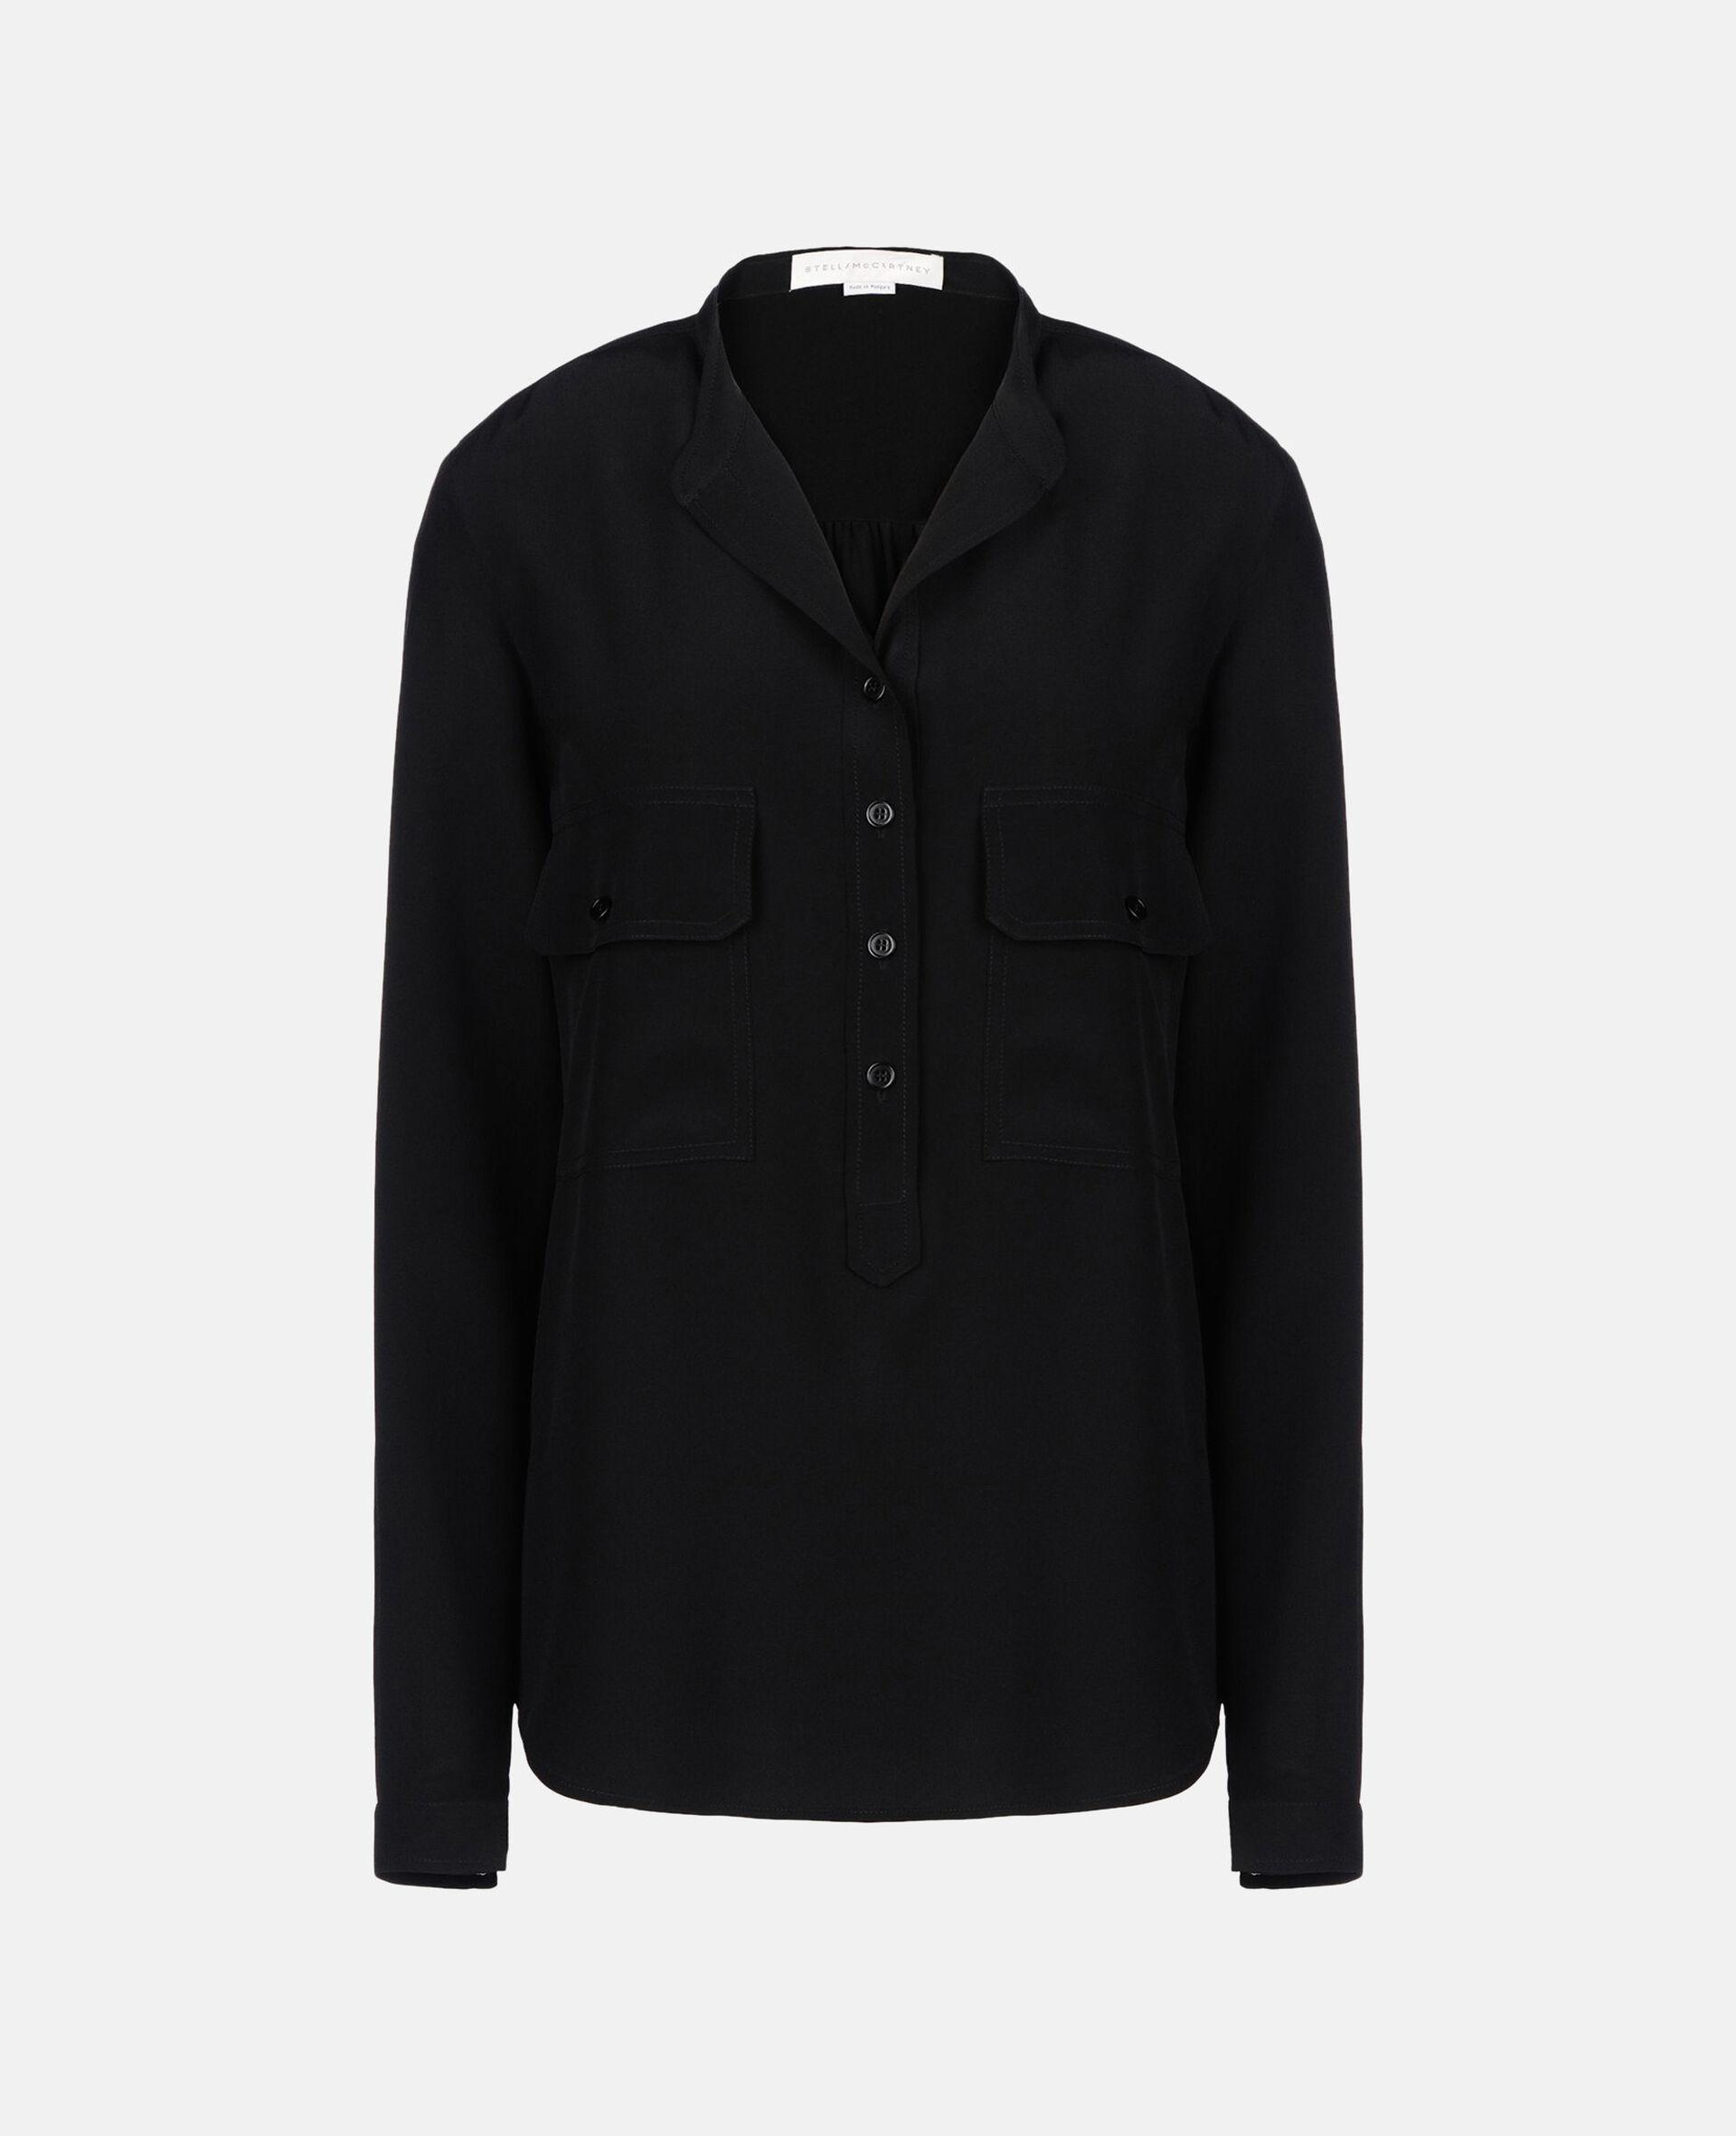 Estelle 衬衫-黑色-large image number 0